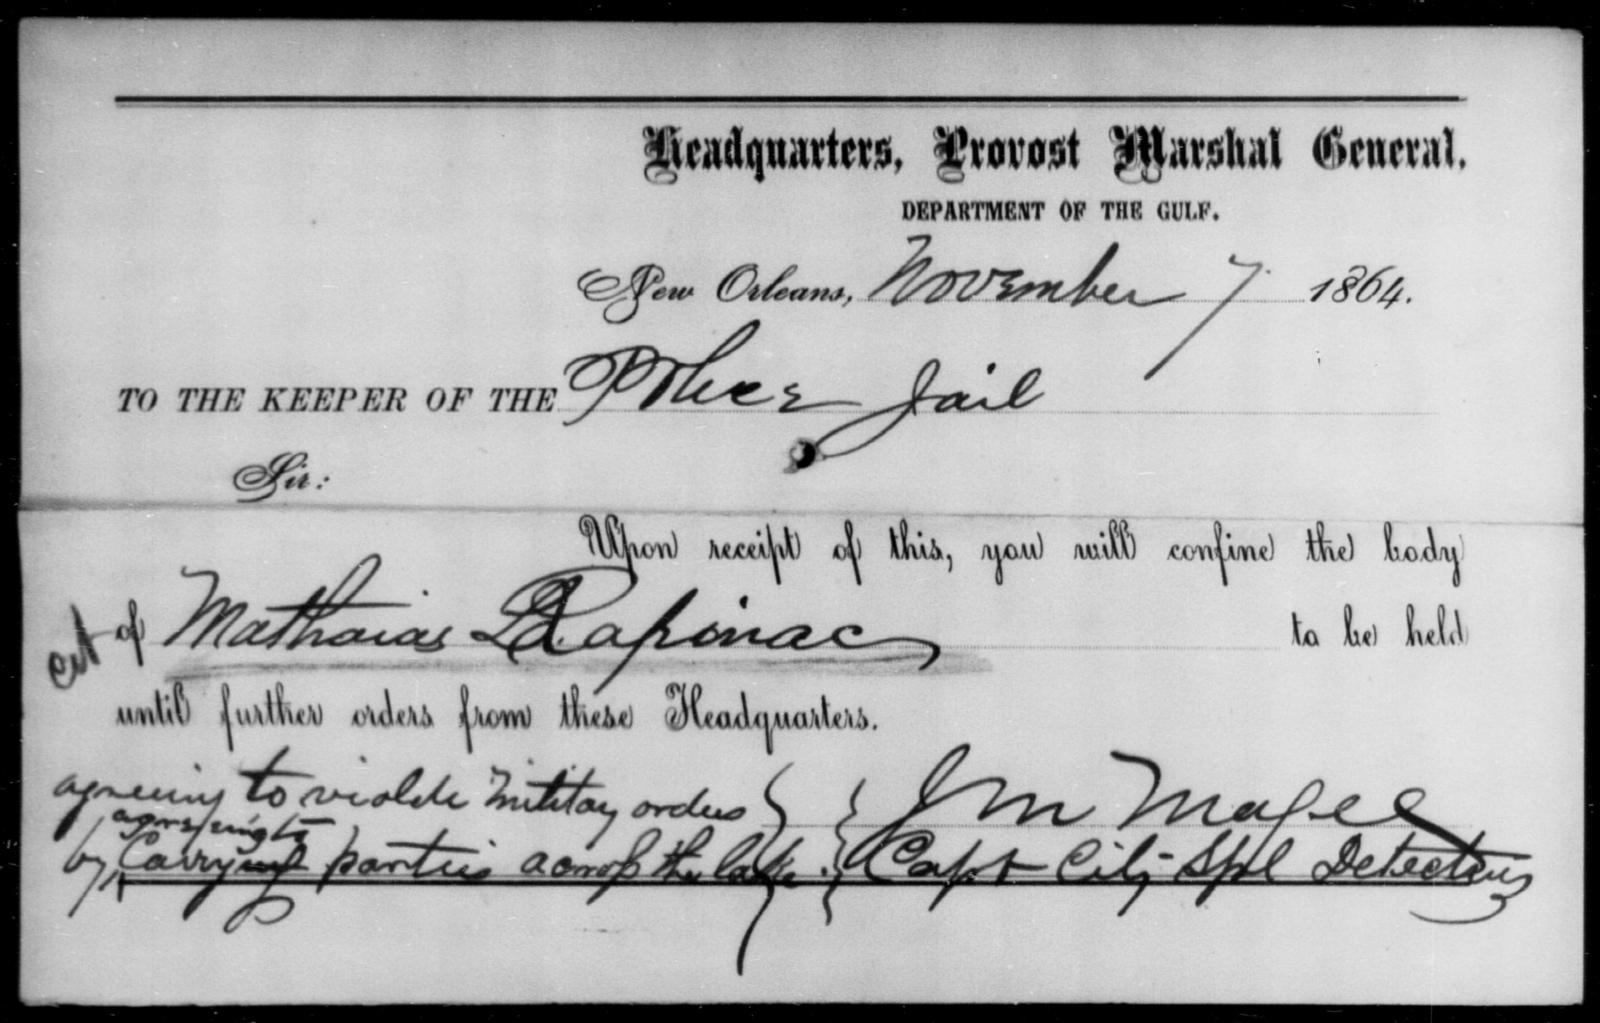 Rapinae, Mathaias - State: [Blank] - Year: 1864